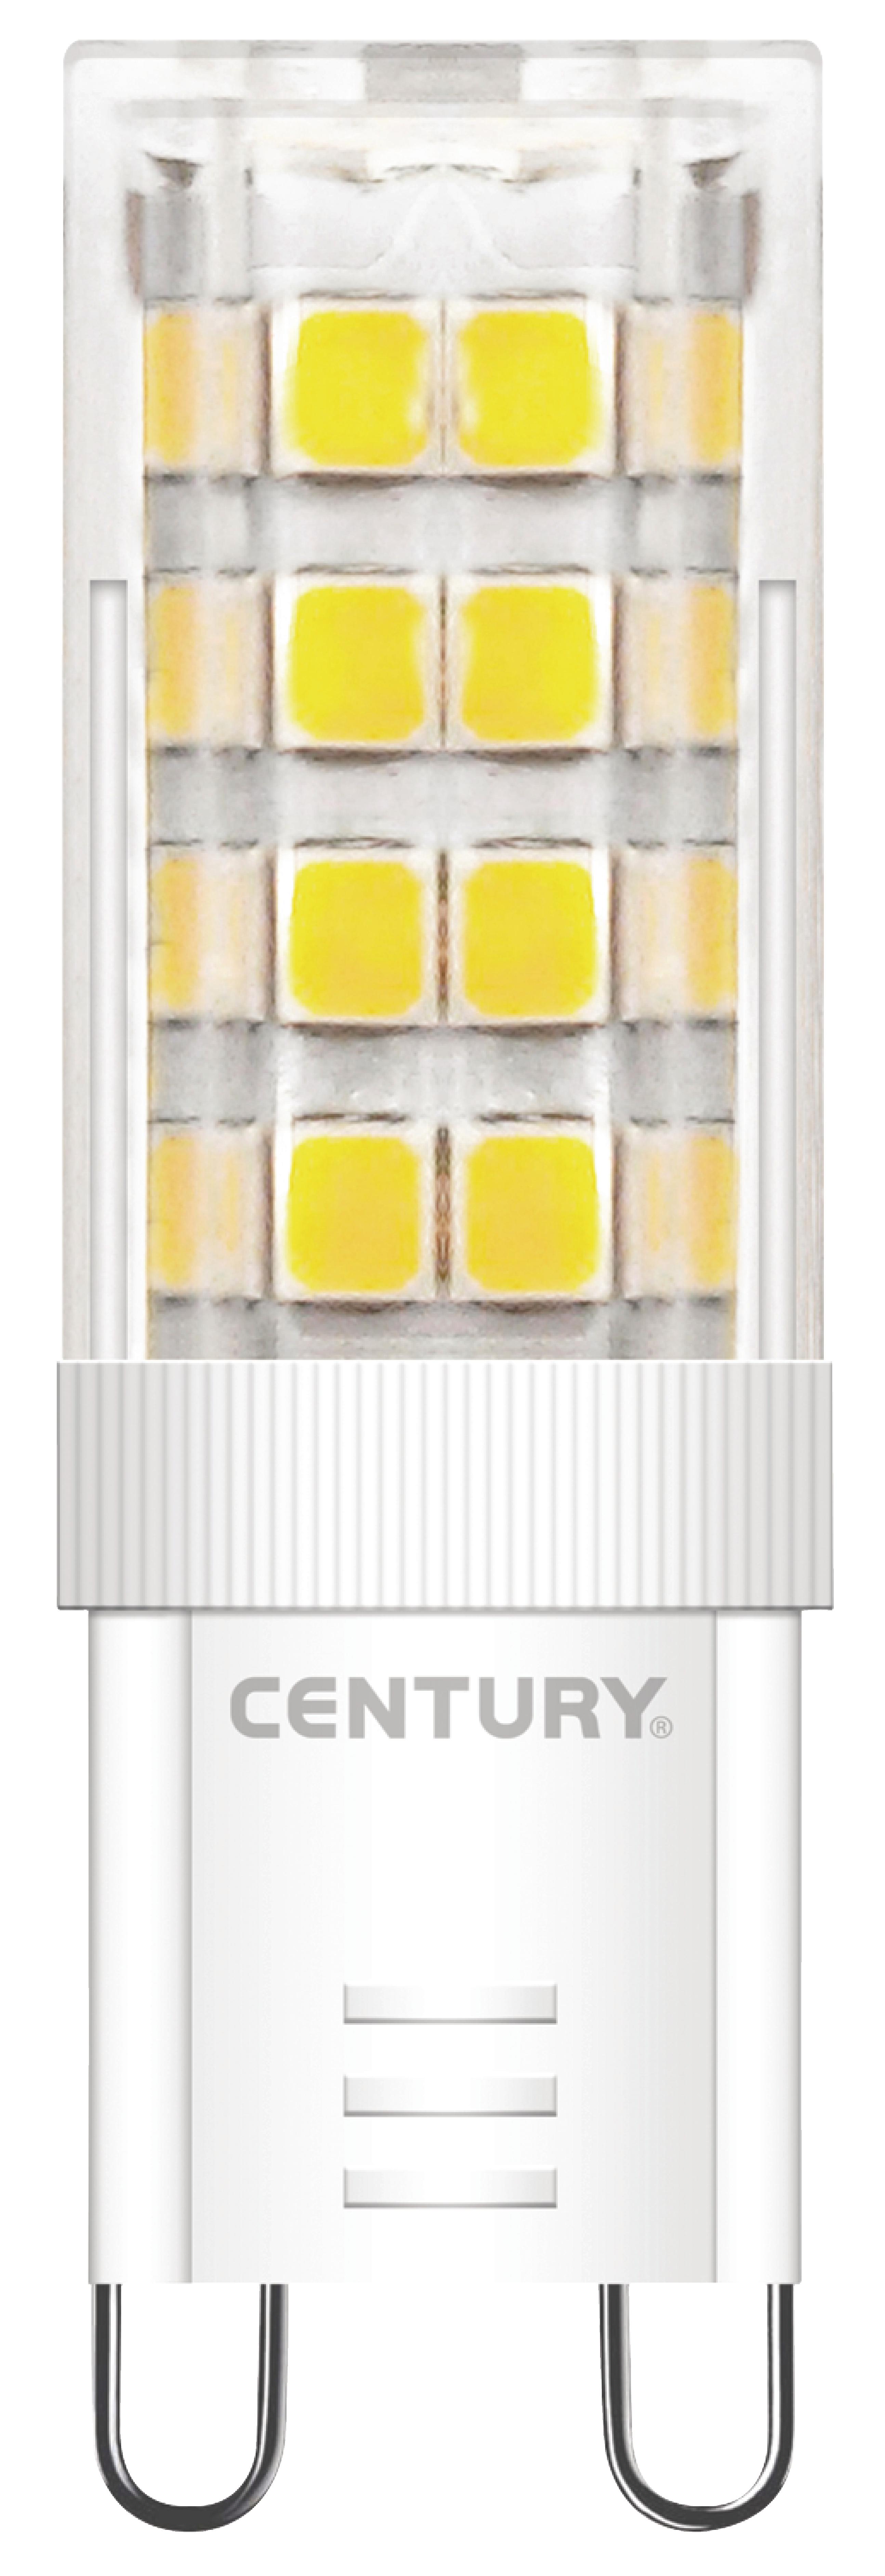 led-lampe-g9-kapsel-35-w-300-lm-3000-k